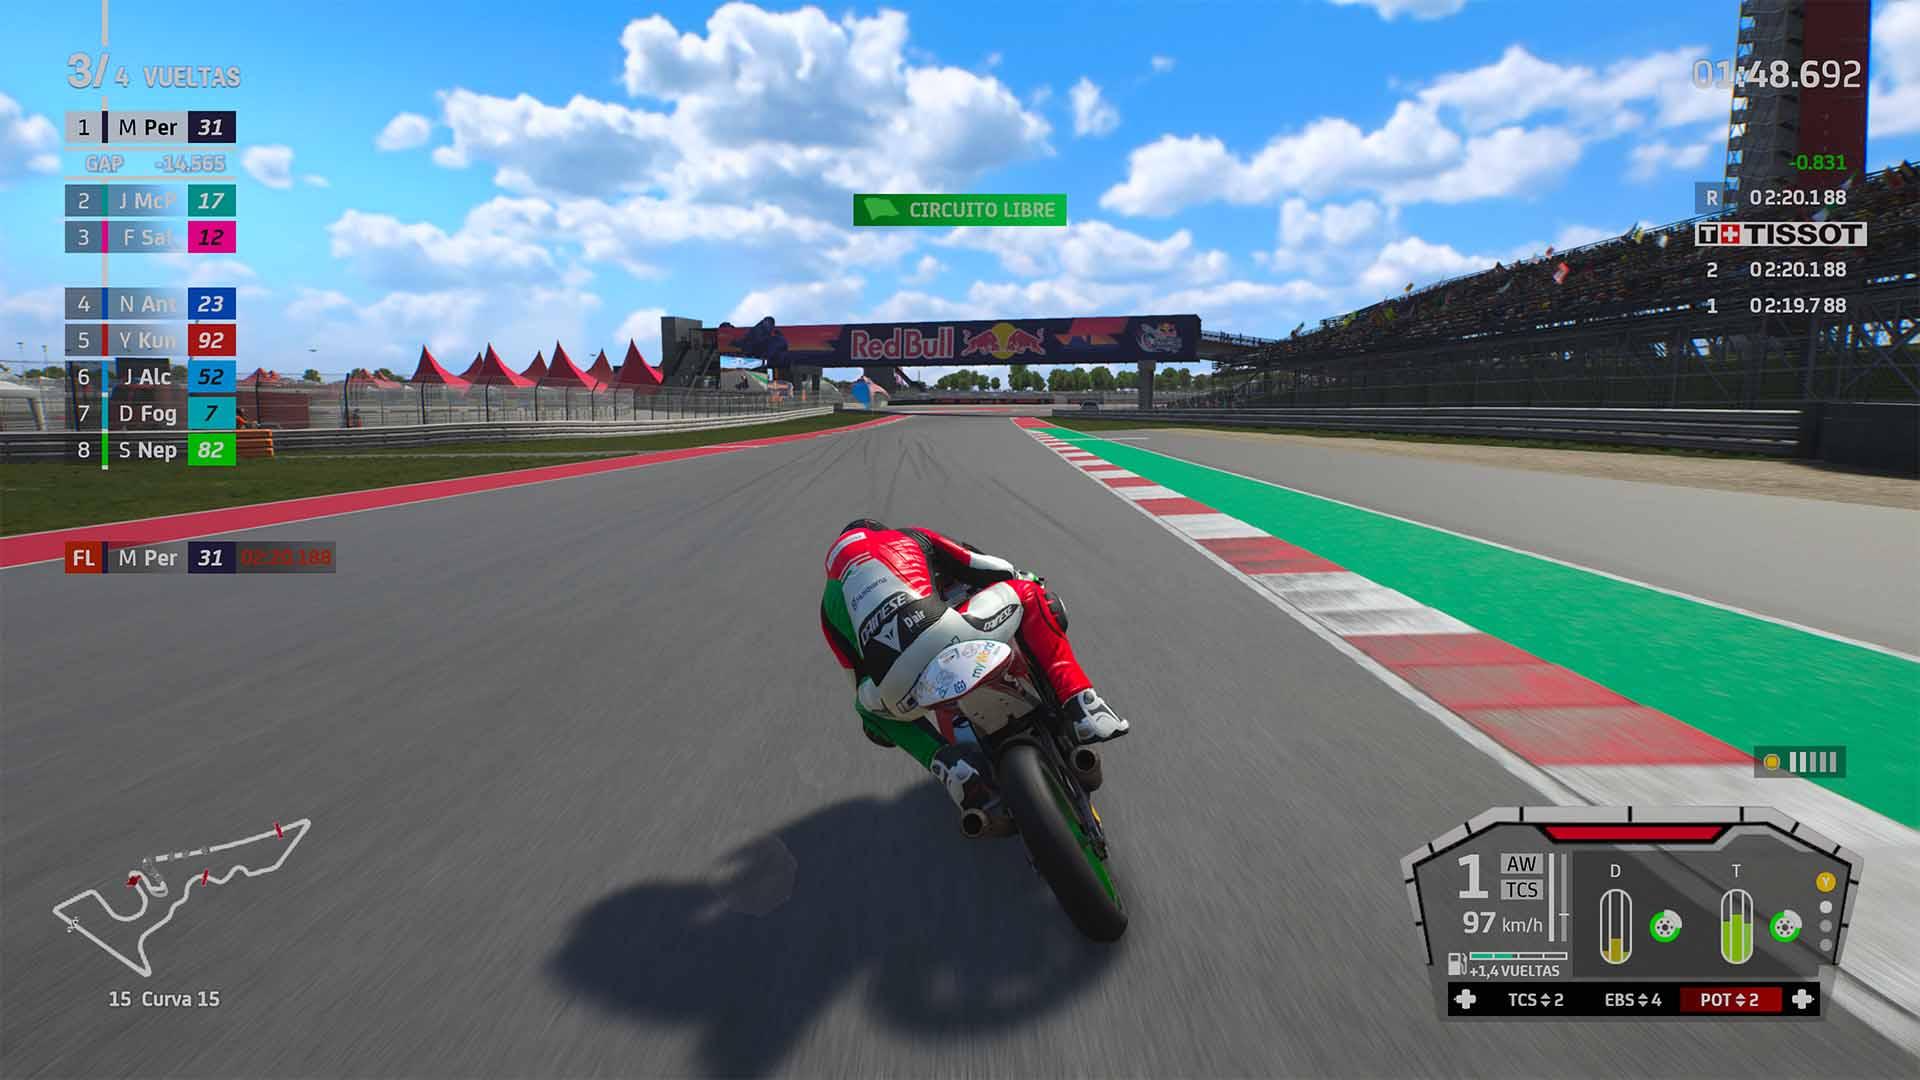 Análisis de MotoGP 21 - Xbox Series X 4